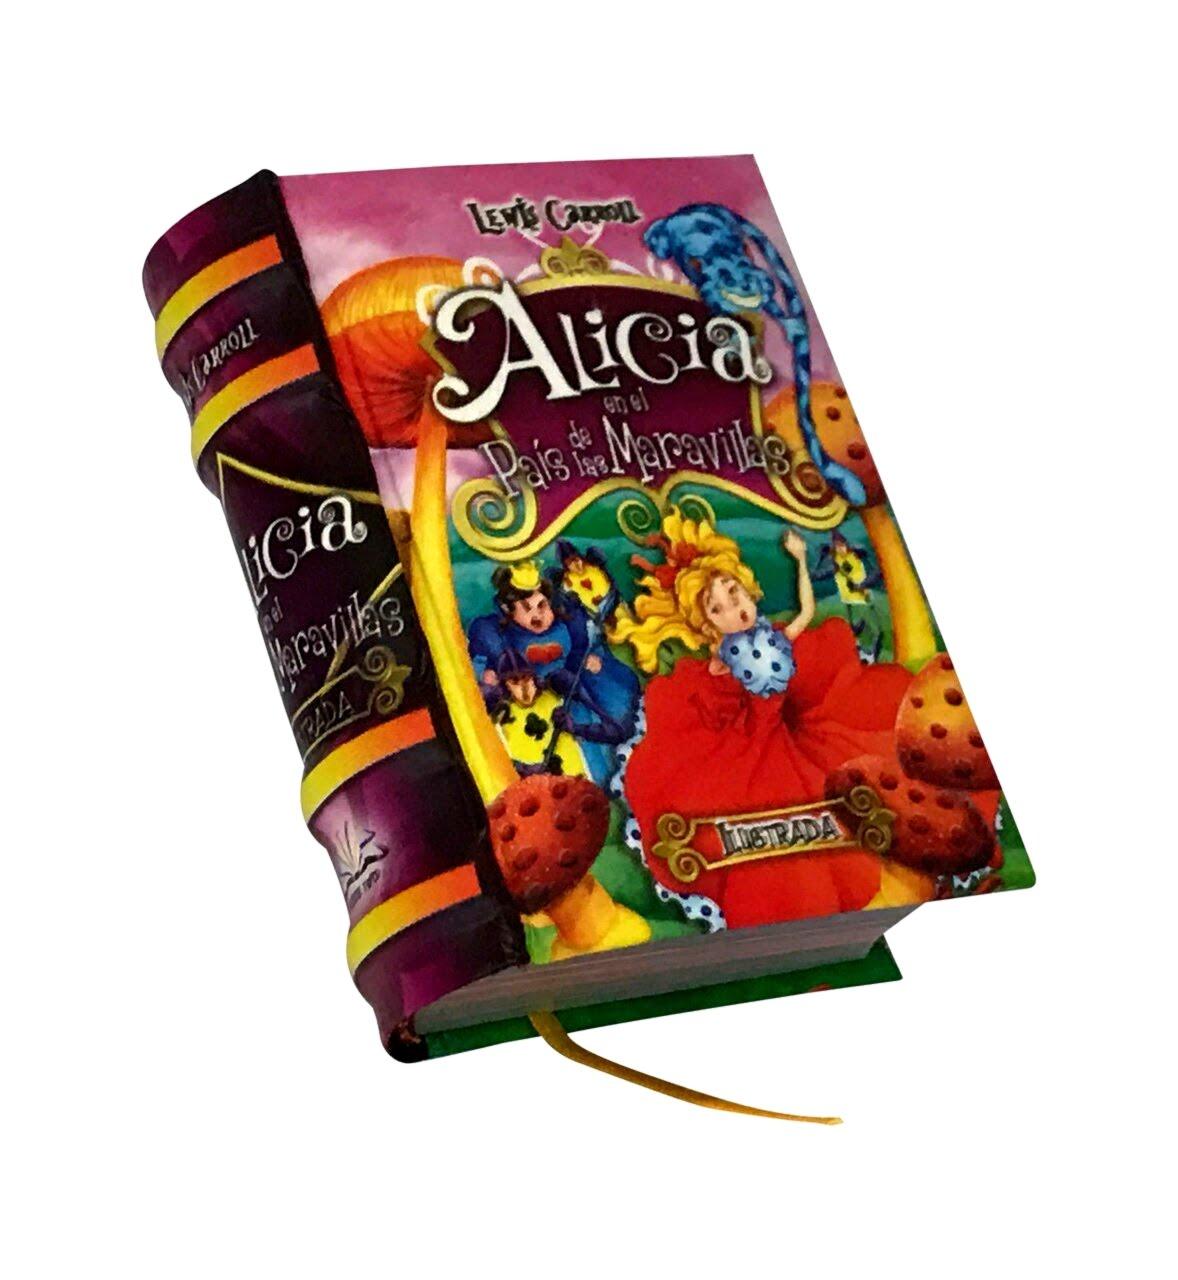 alicia_pais-maravillas-ilustrada-miniature-book-libro